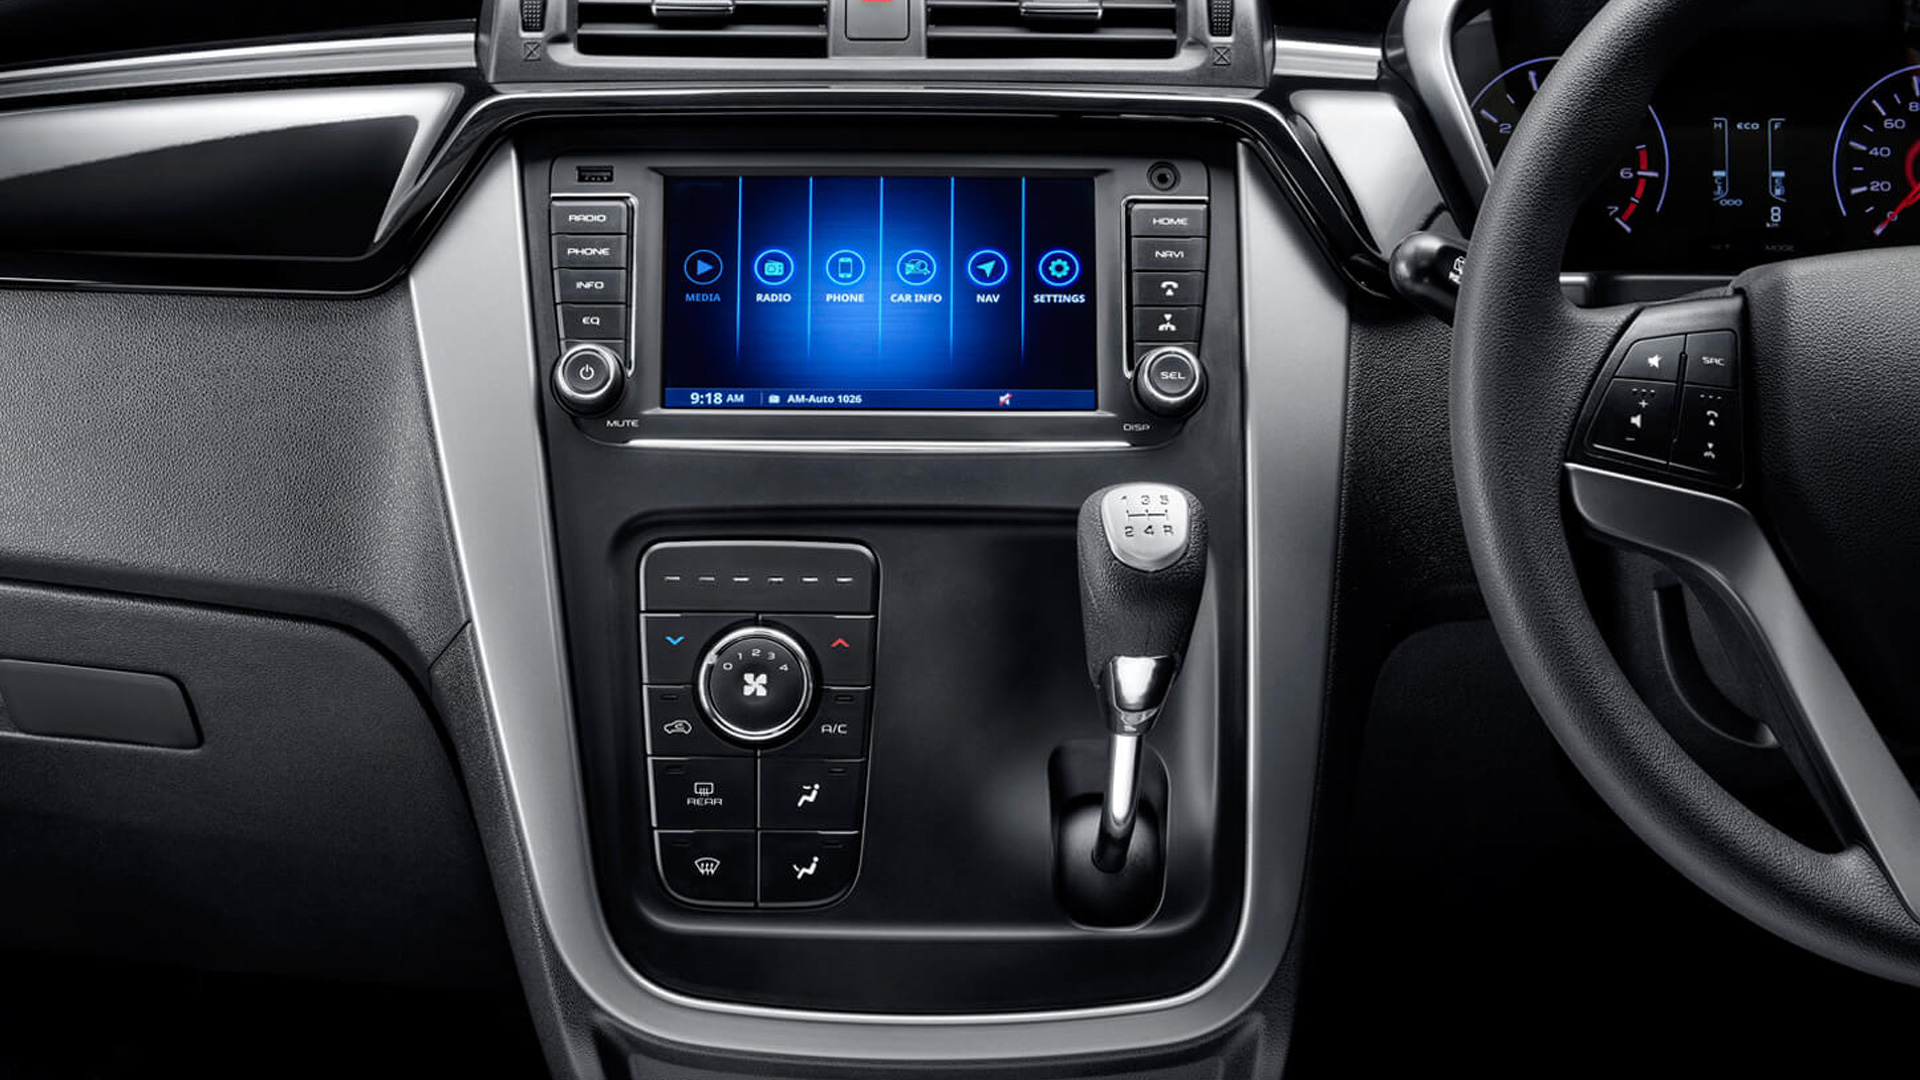 Mahindra KUV 100 nxt 2020 K8 Petrol 6 Str Interior